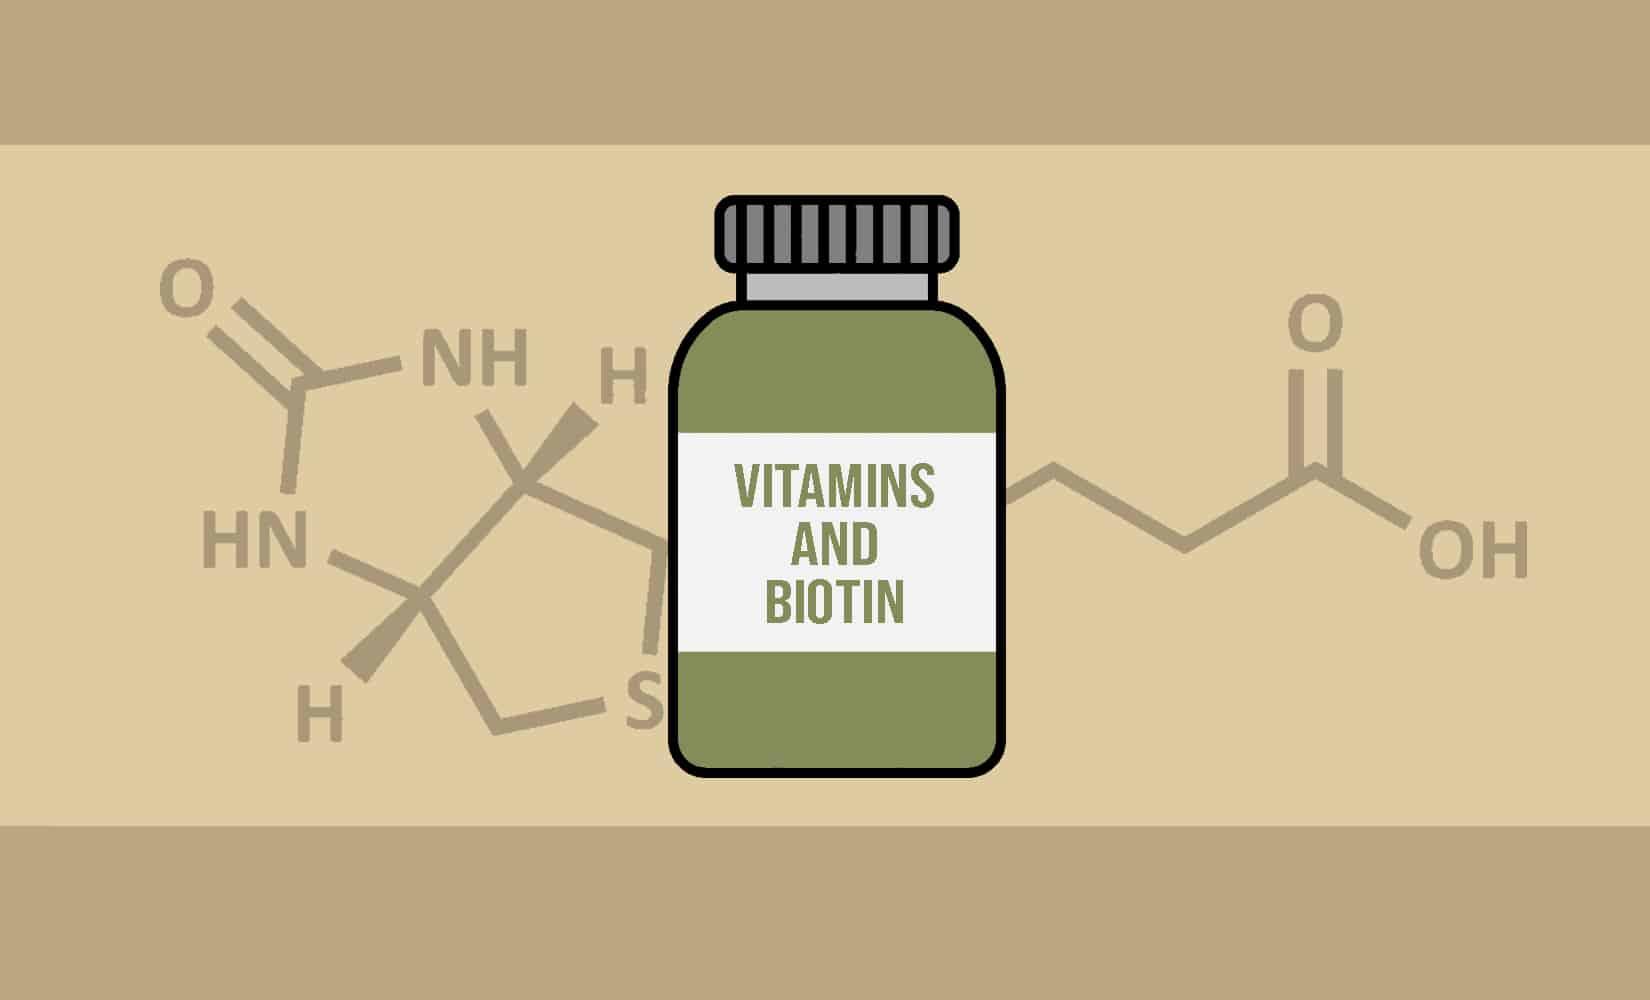 Vitamins (and Biotin)